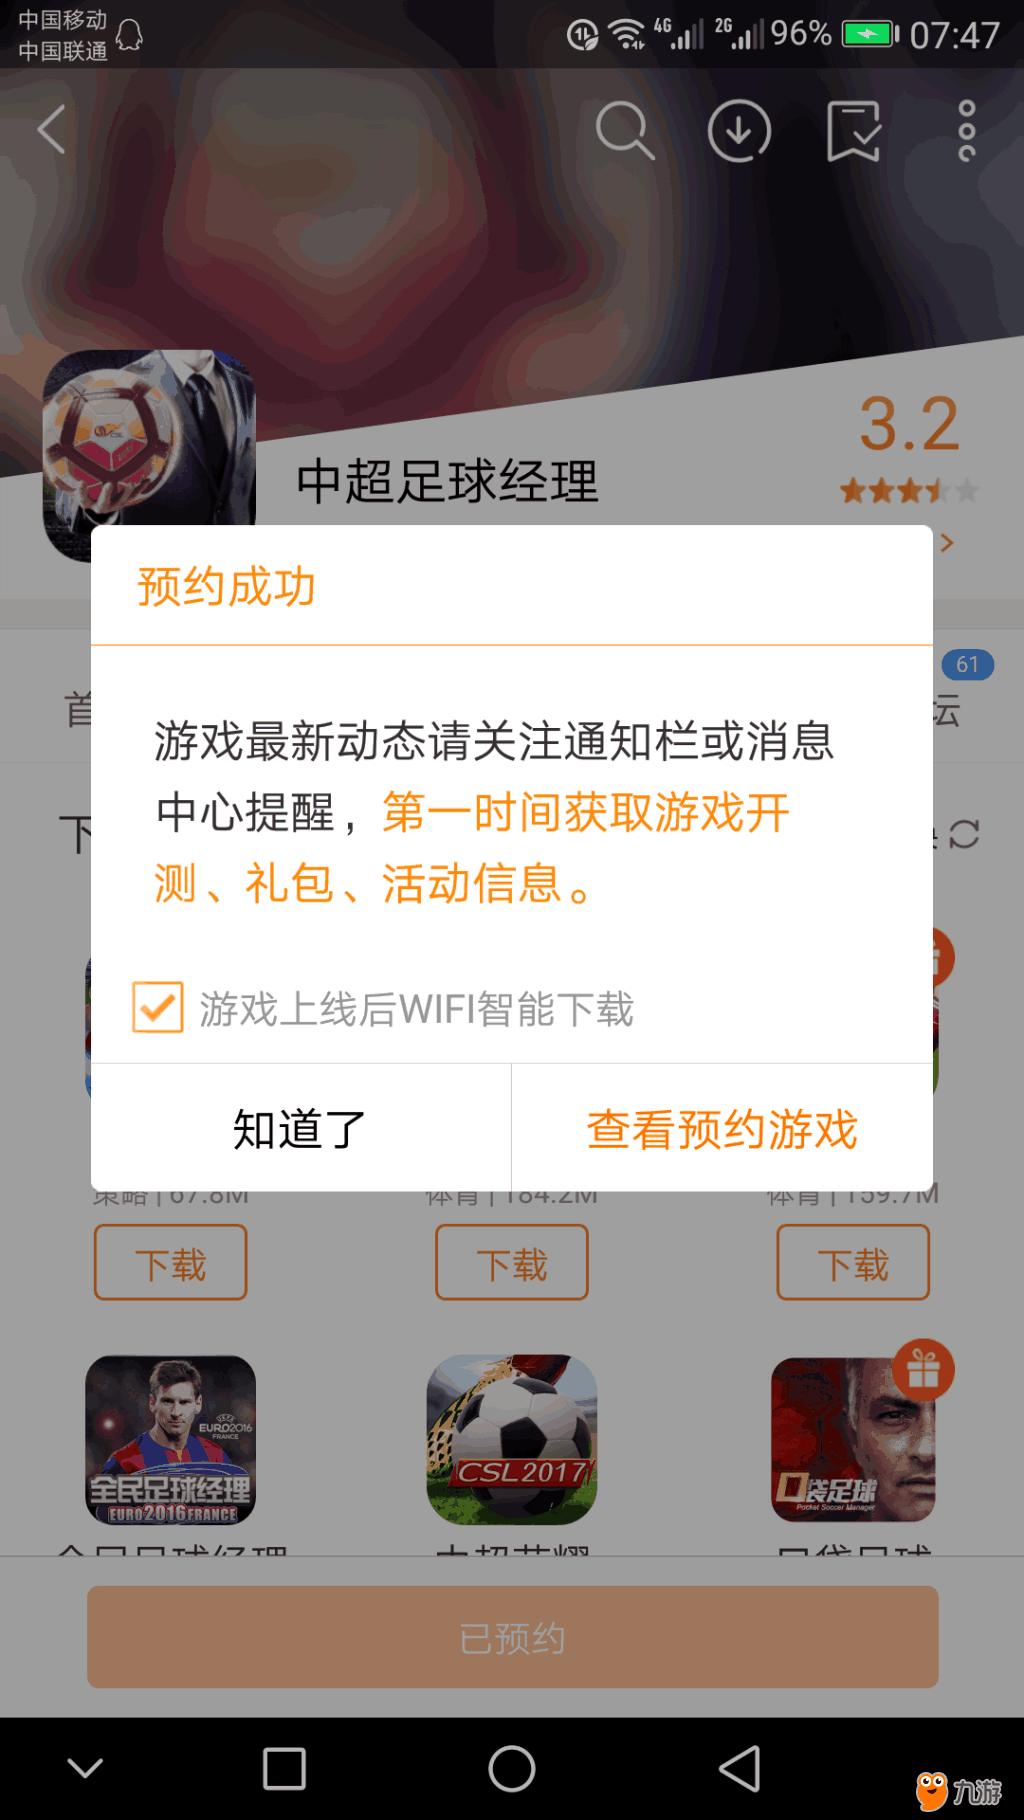 Screenshot_20180604s074713.png